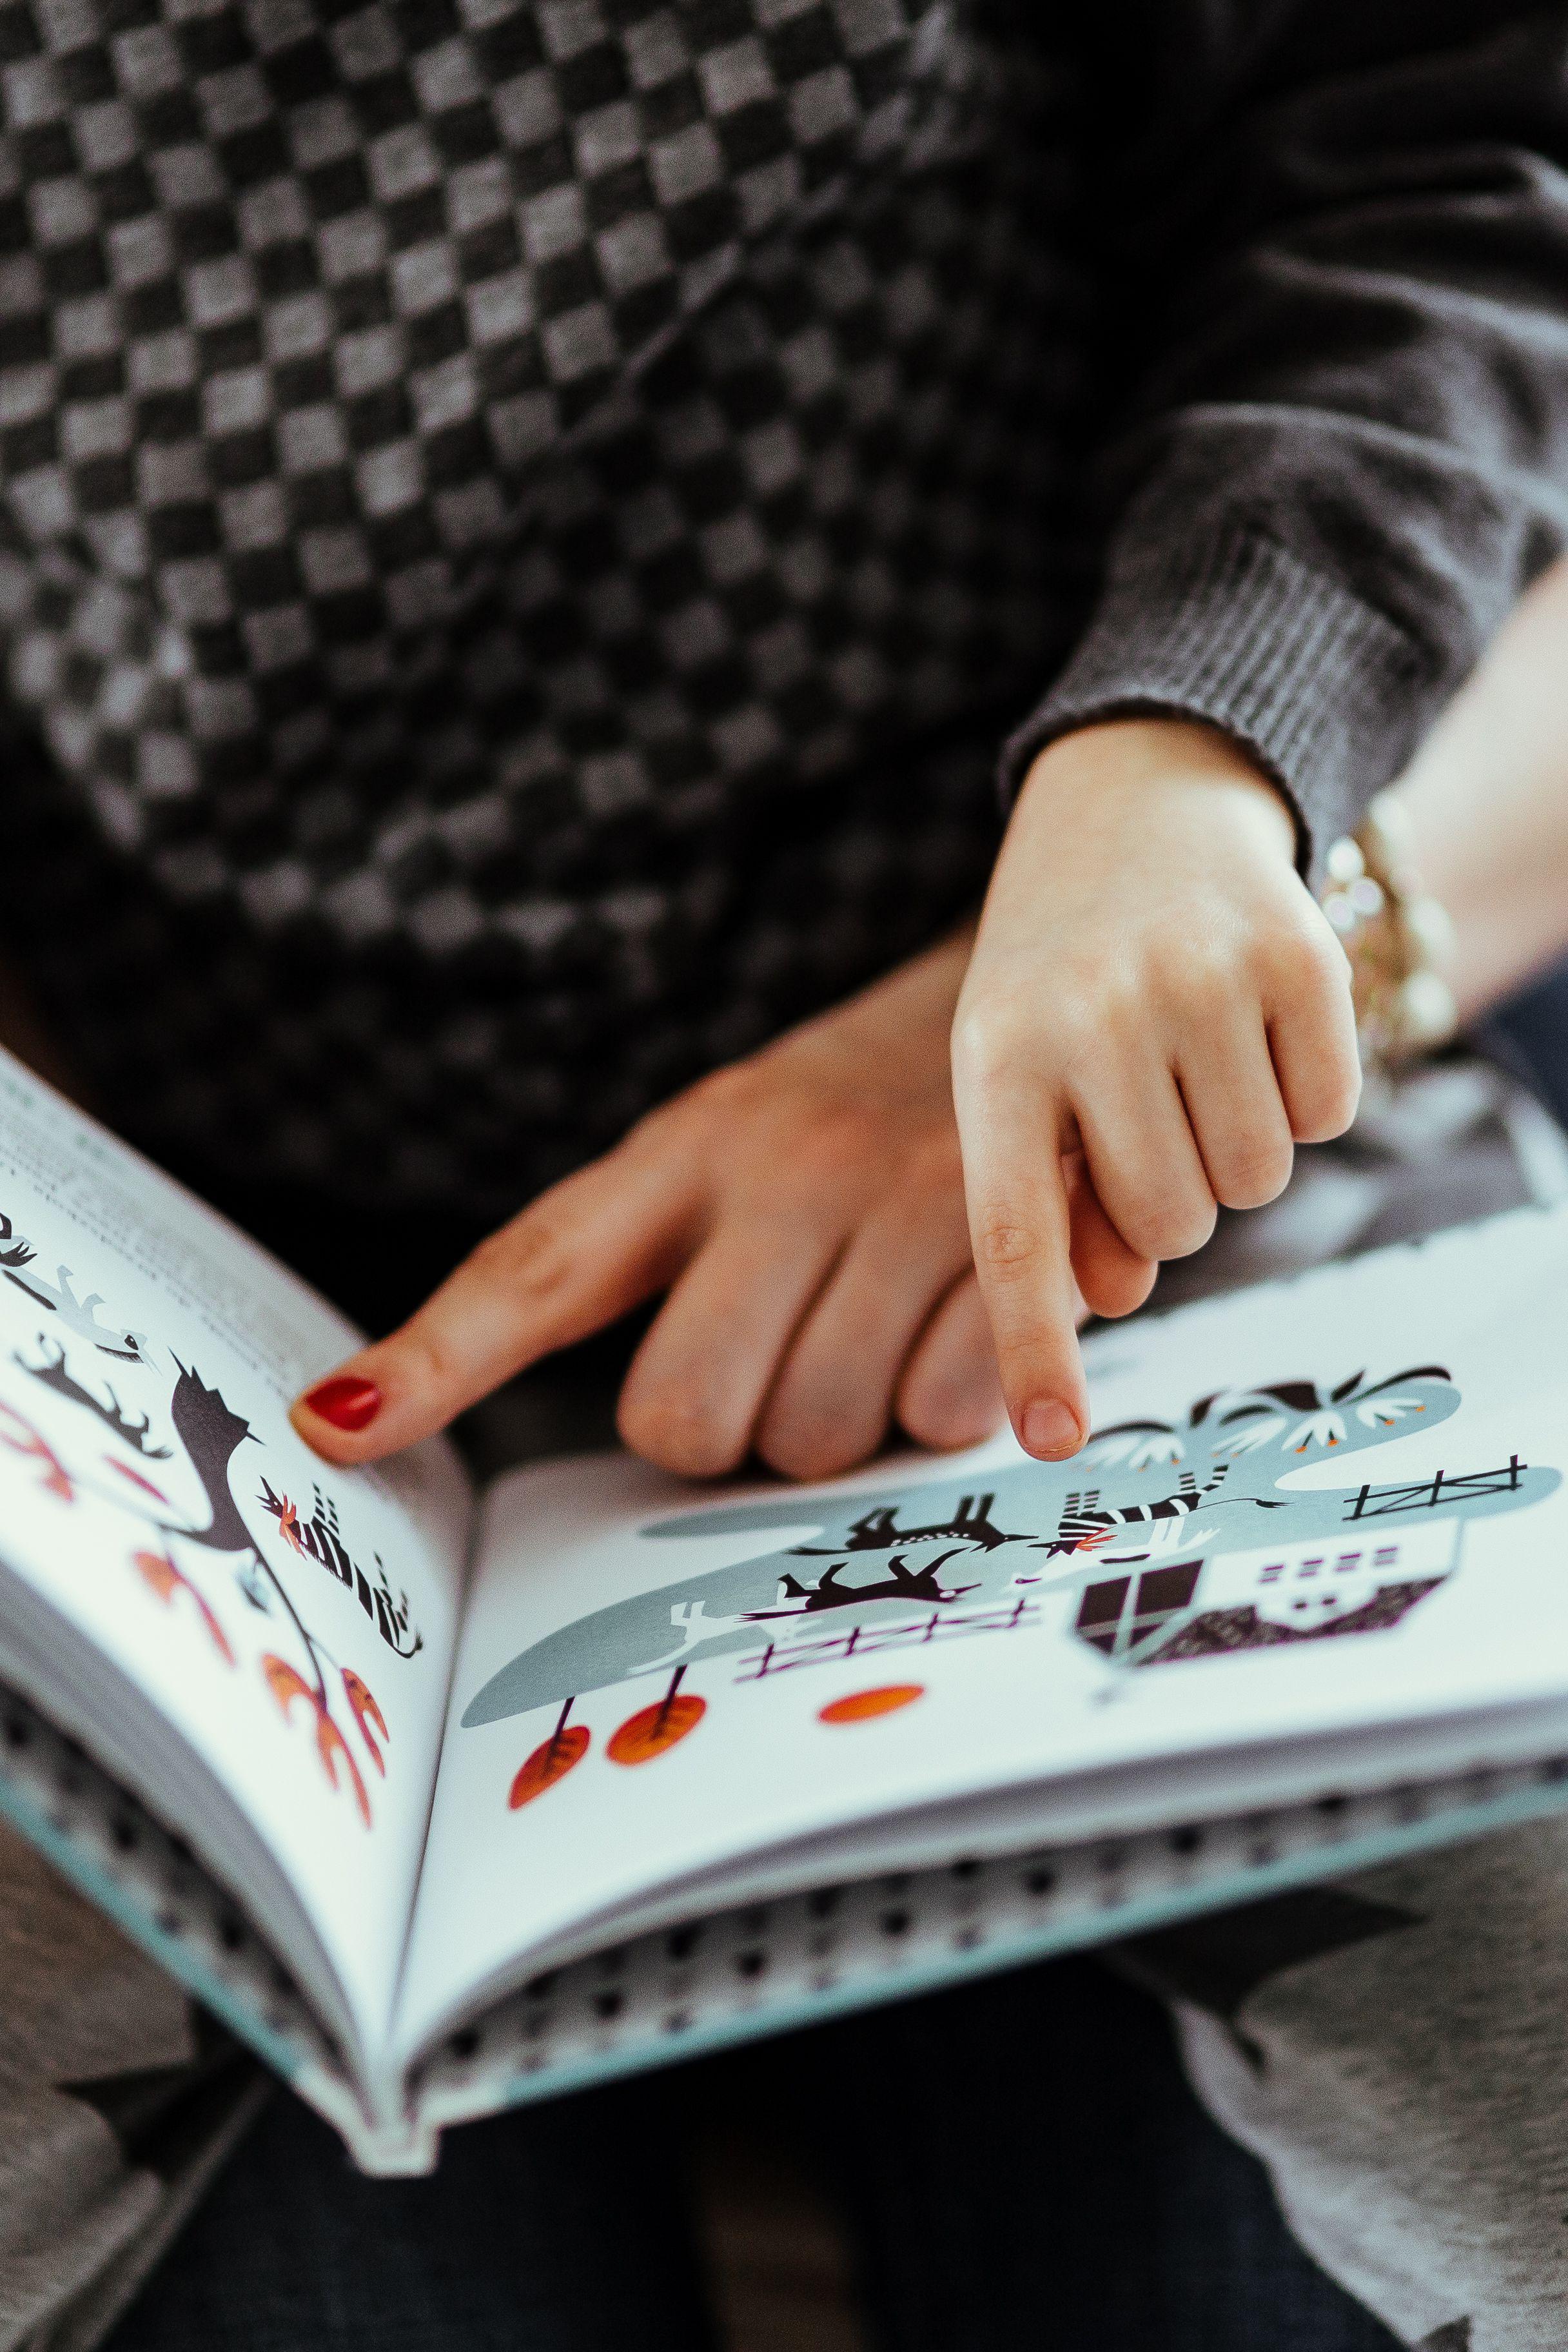 kaboompics_Child reading a book.jpg